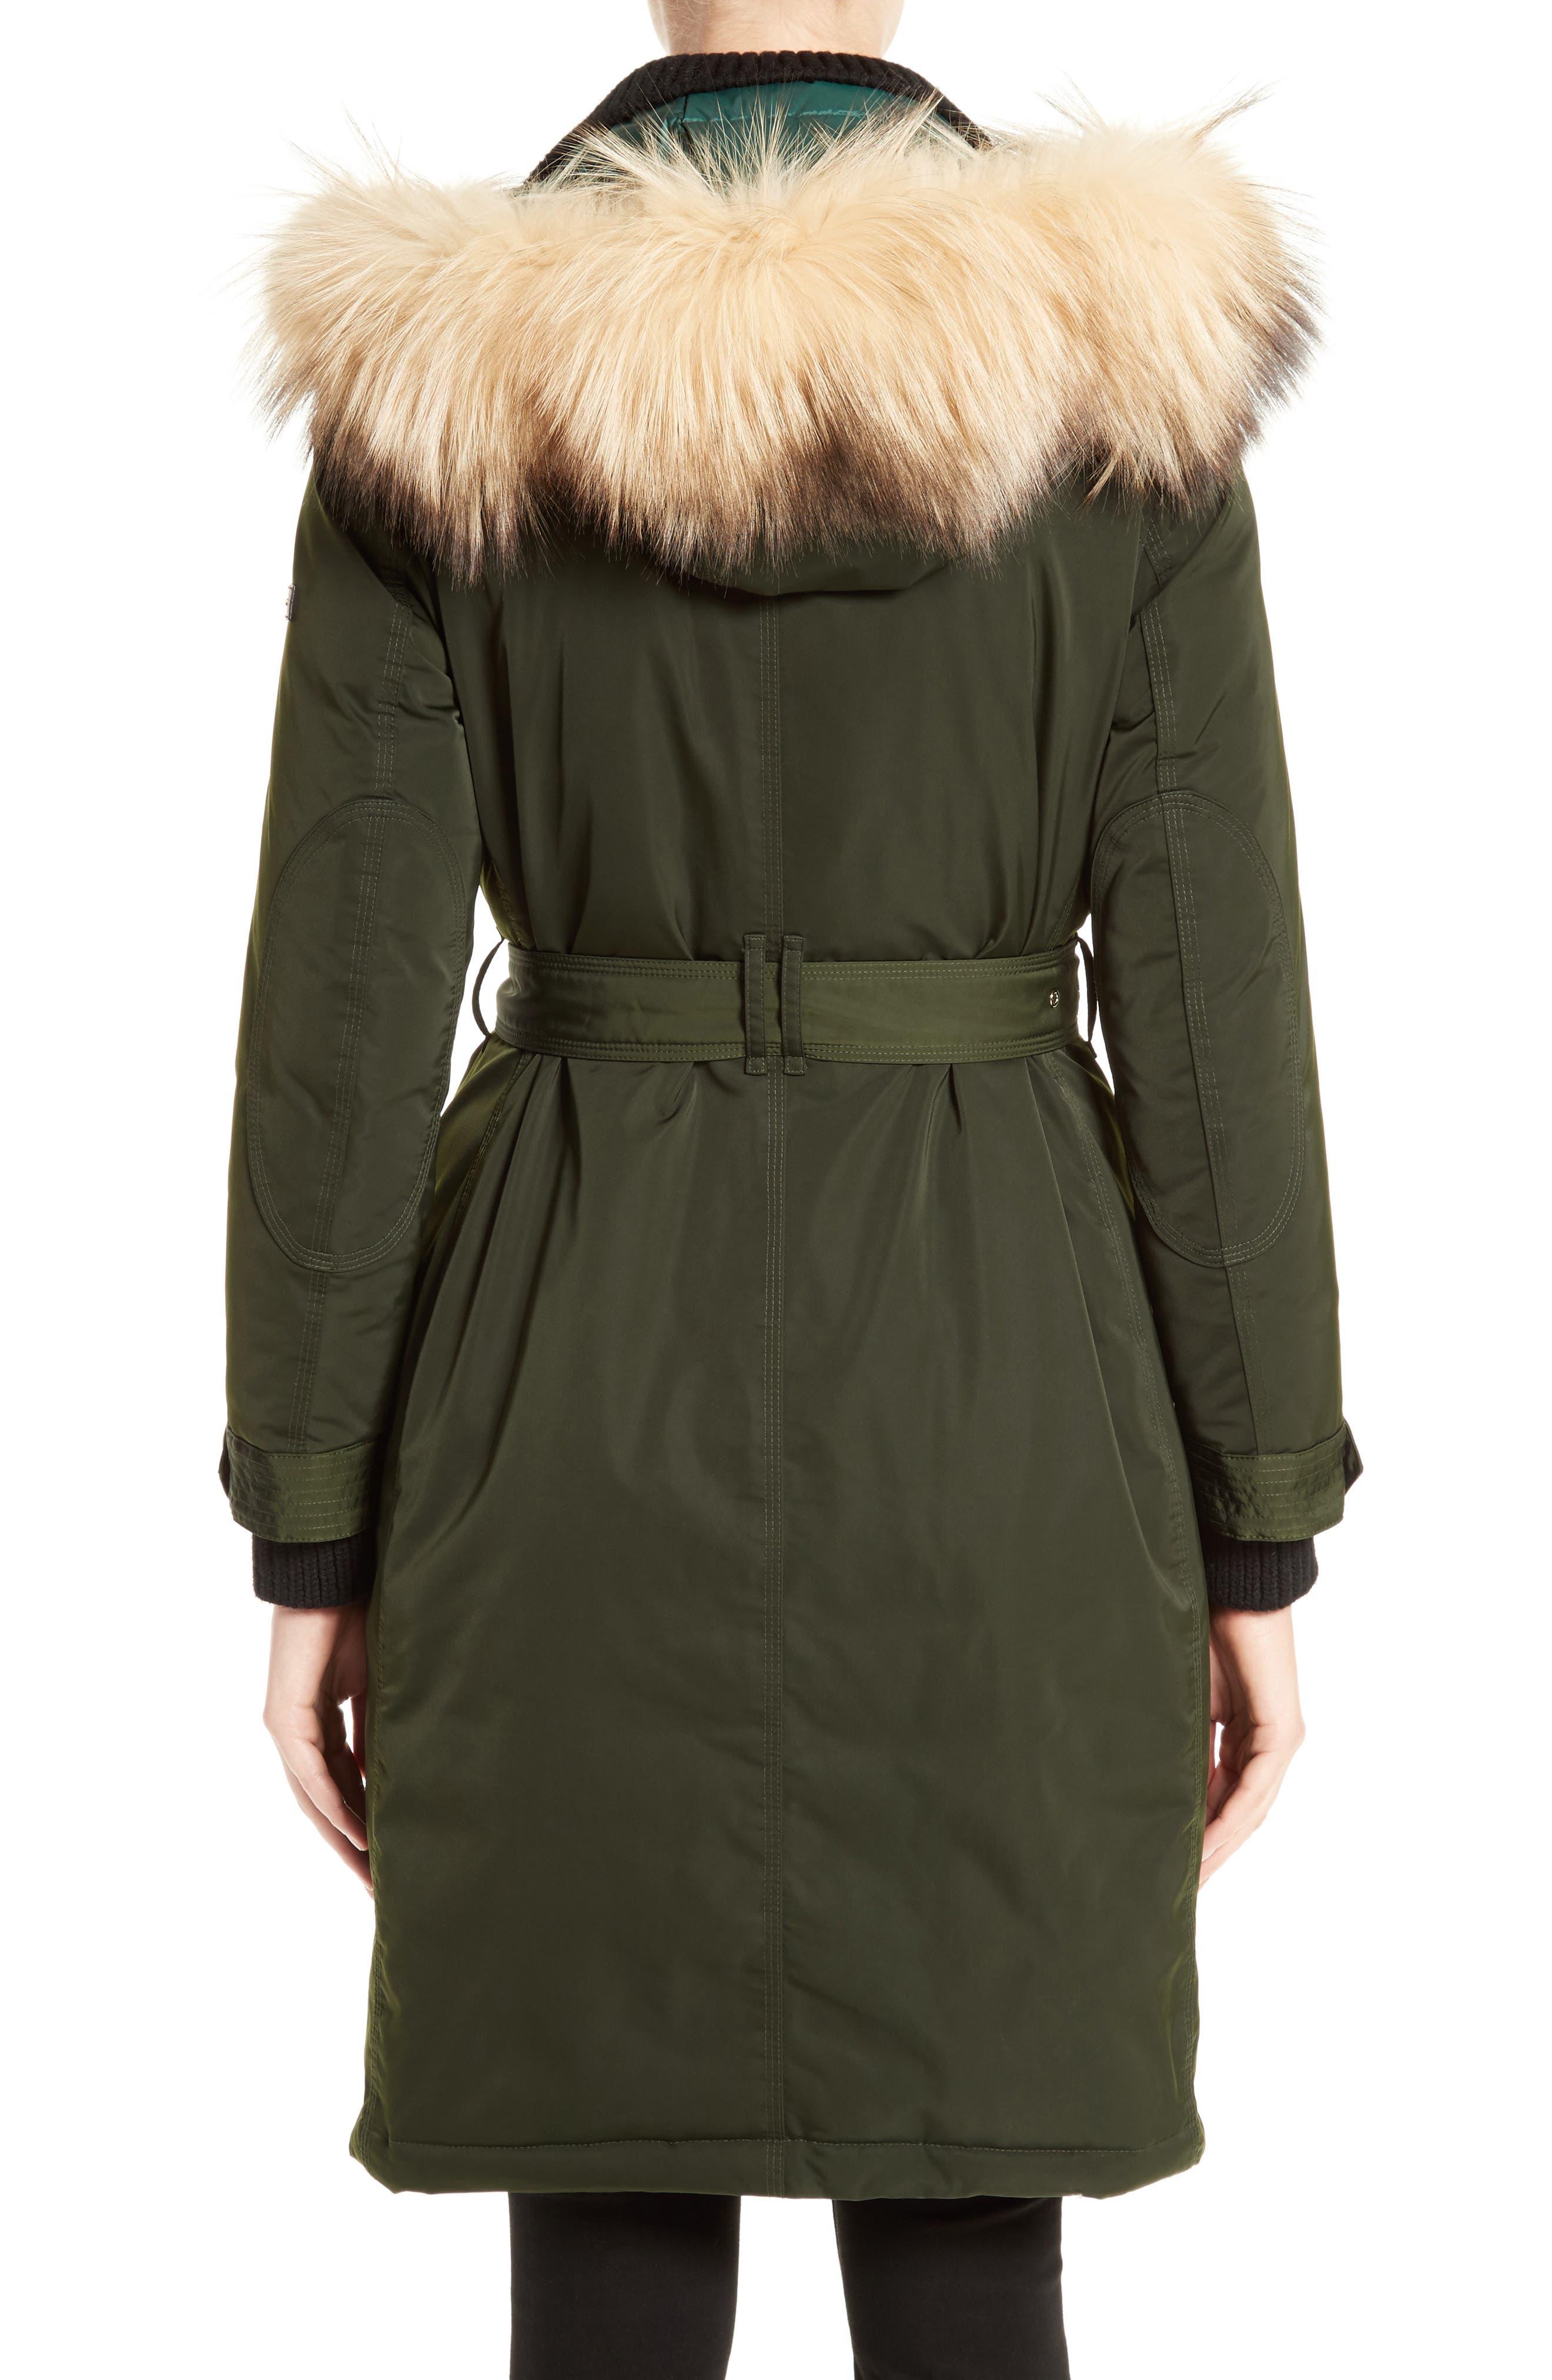 Hunnbridge Parka with Genuine Fox Fur Trim,                             Alternate thumbnail 2, color,                             Dark Cedar Green